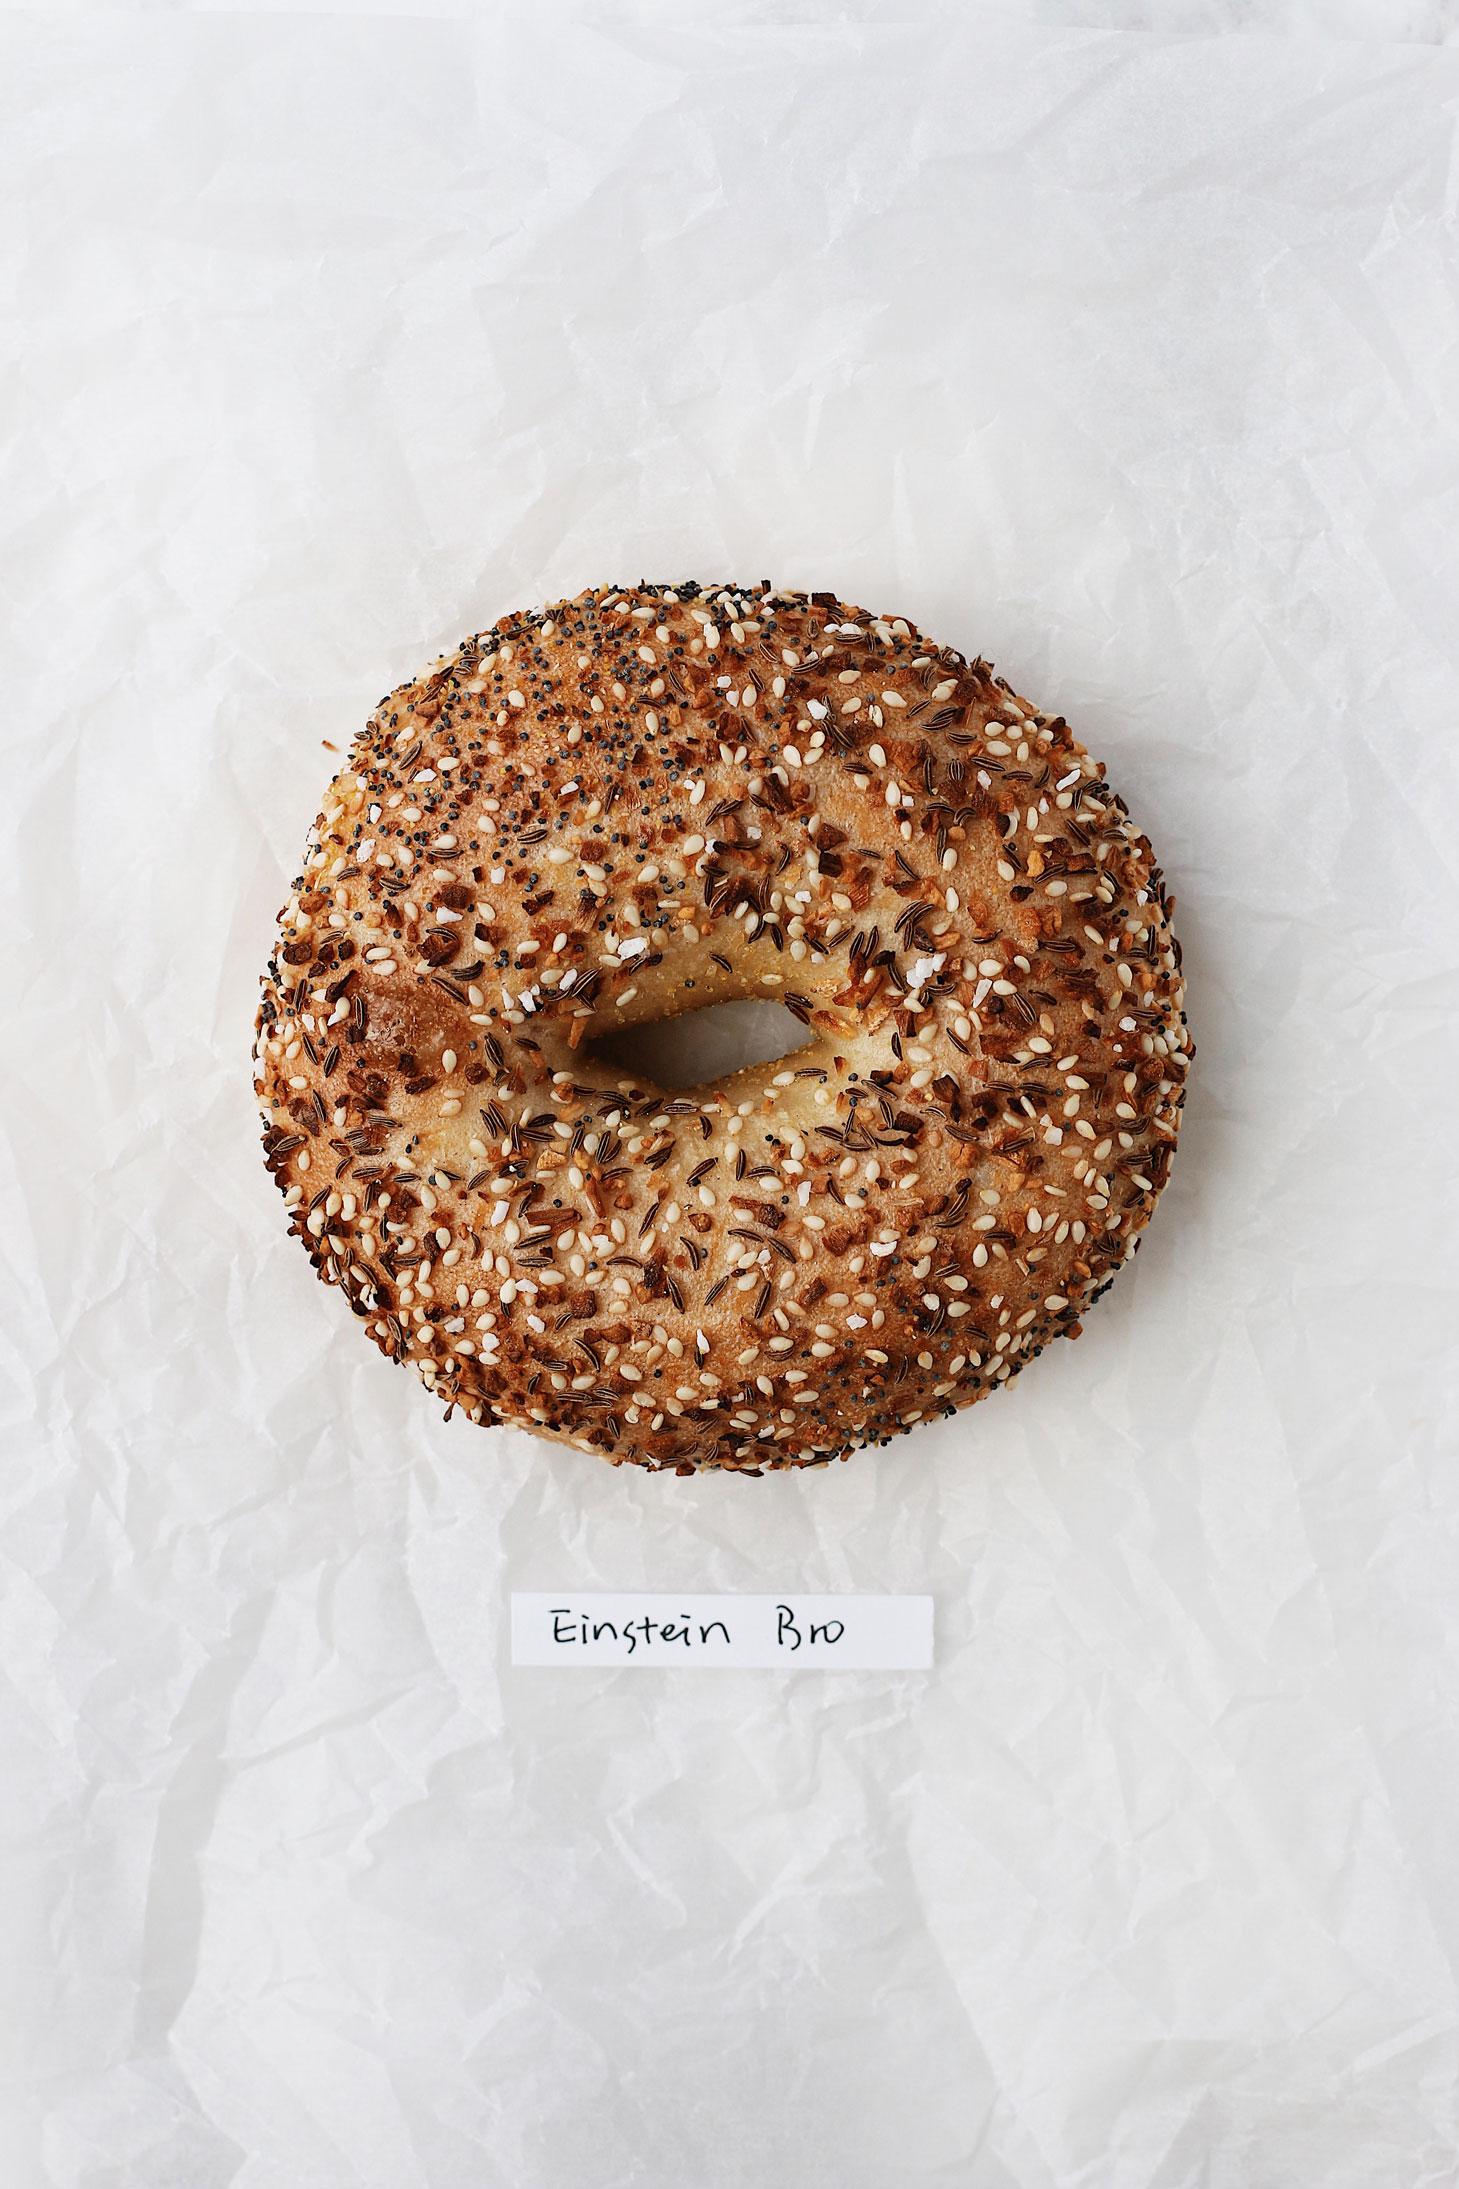 best-bagel-in-seattle-great-bagel-off-einstein-bro-everthing